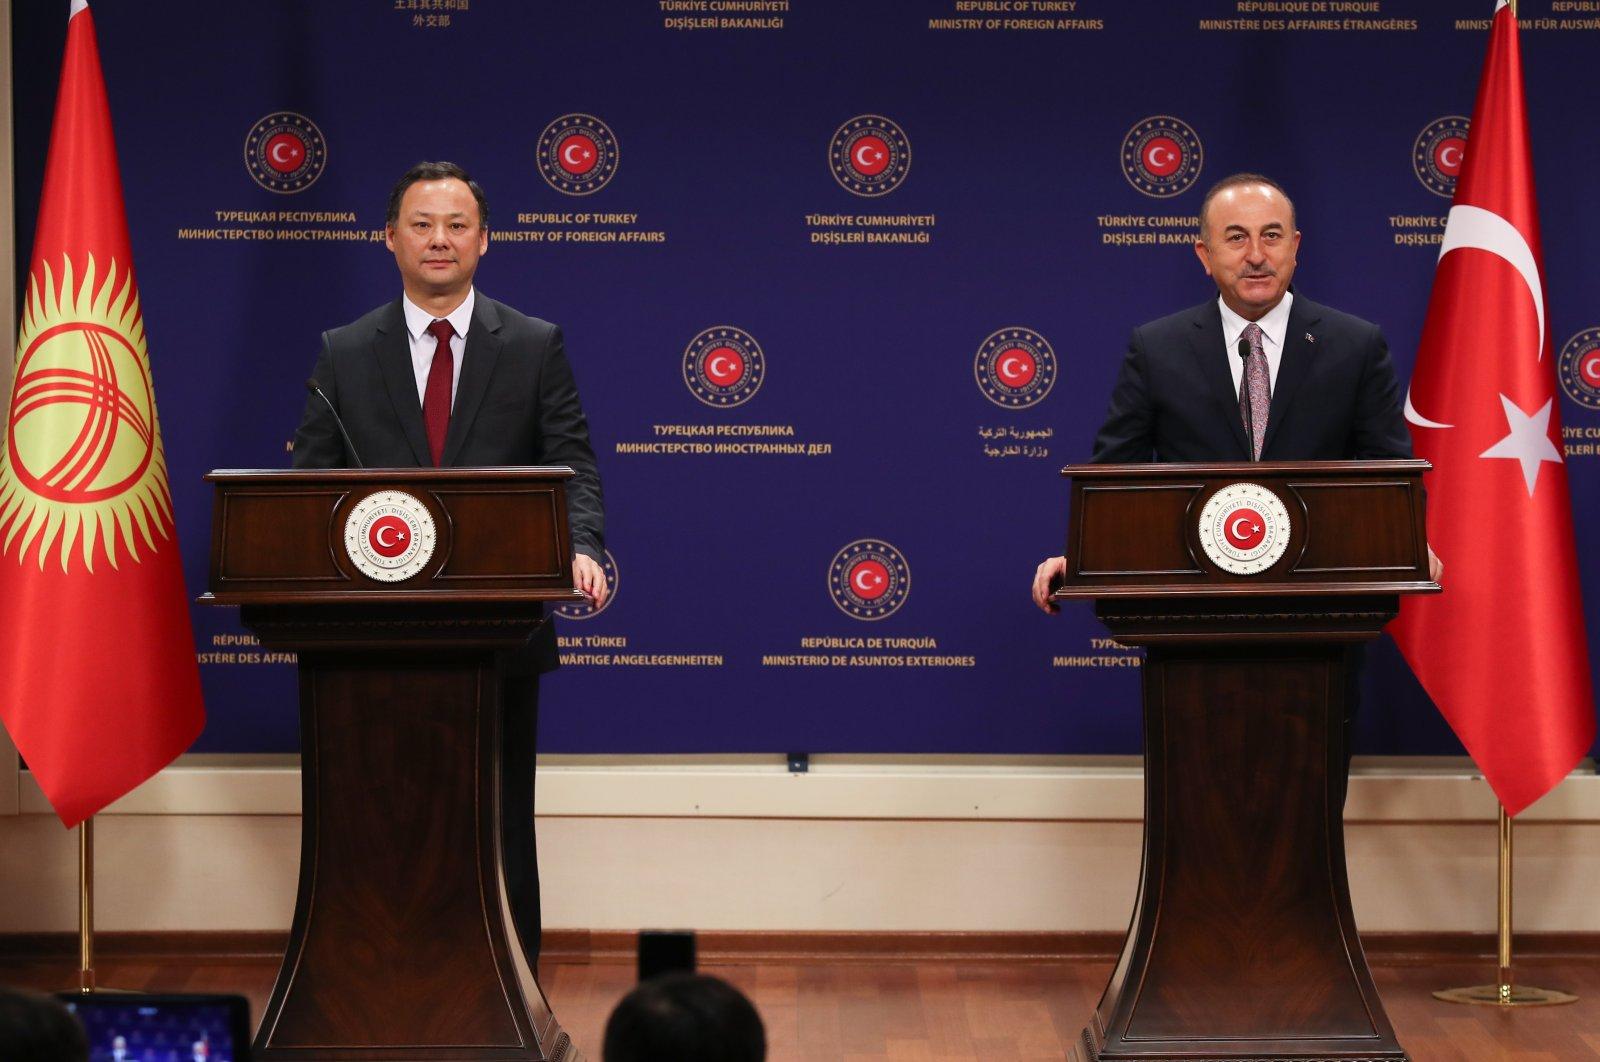 Foreign Minister Mevlüt Çavuşoğlu (R) and his Kyrgyz counterpart Ruslan Kazakbaev speak during a joint press conference in the capital Ankara, Nov. 10, 2020. (AA Photo)